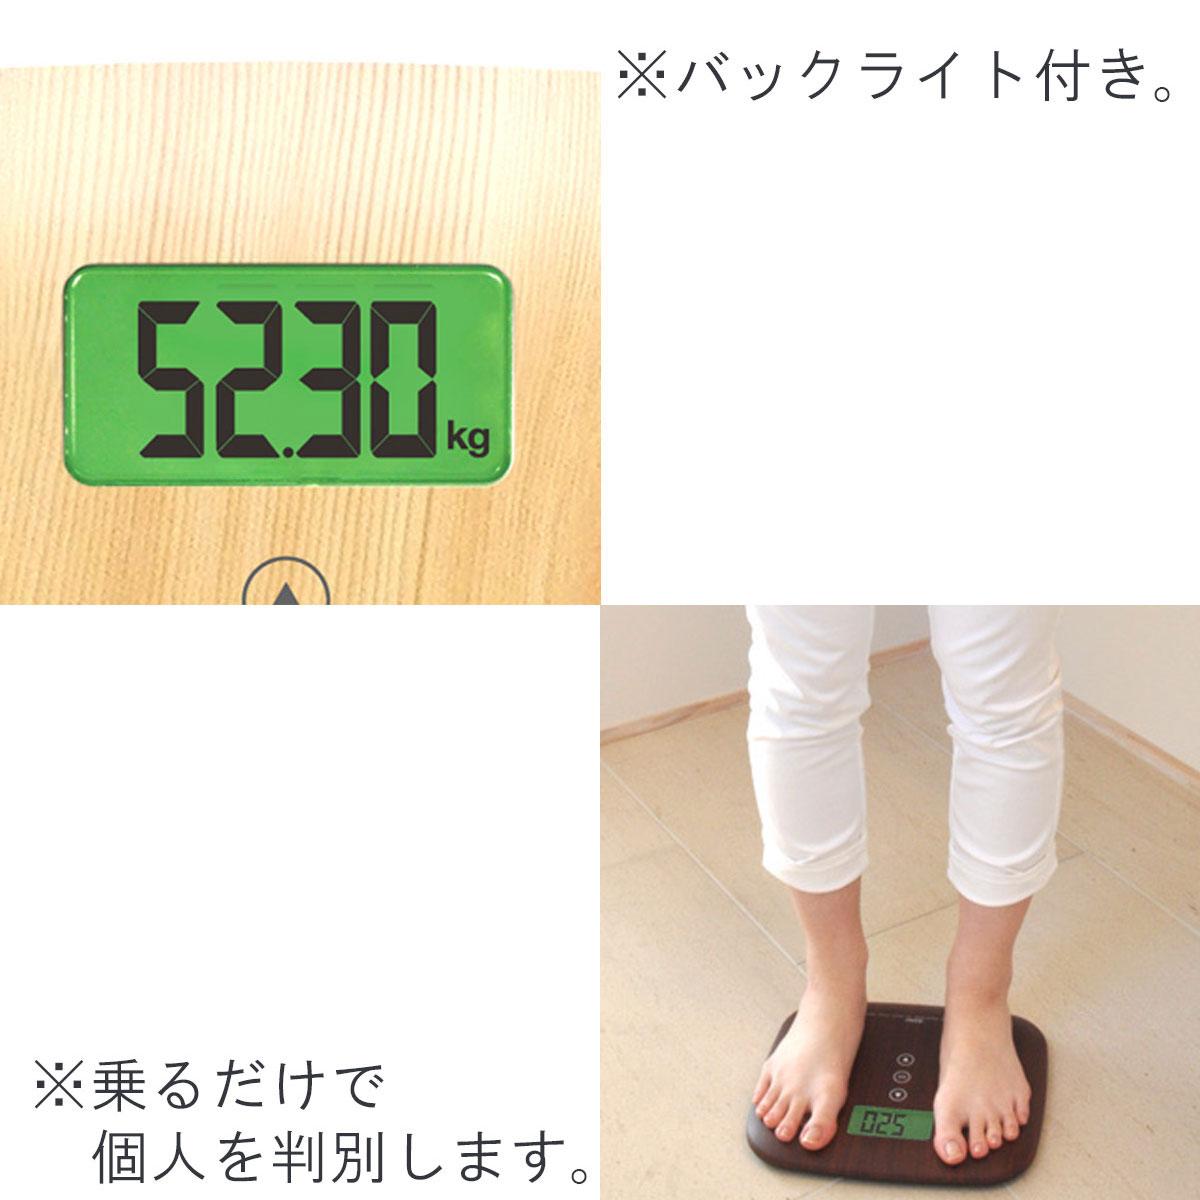 dretec(ドリテック)体重体組成計 BS-244